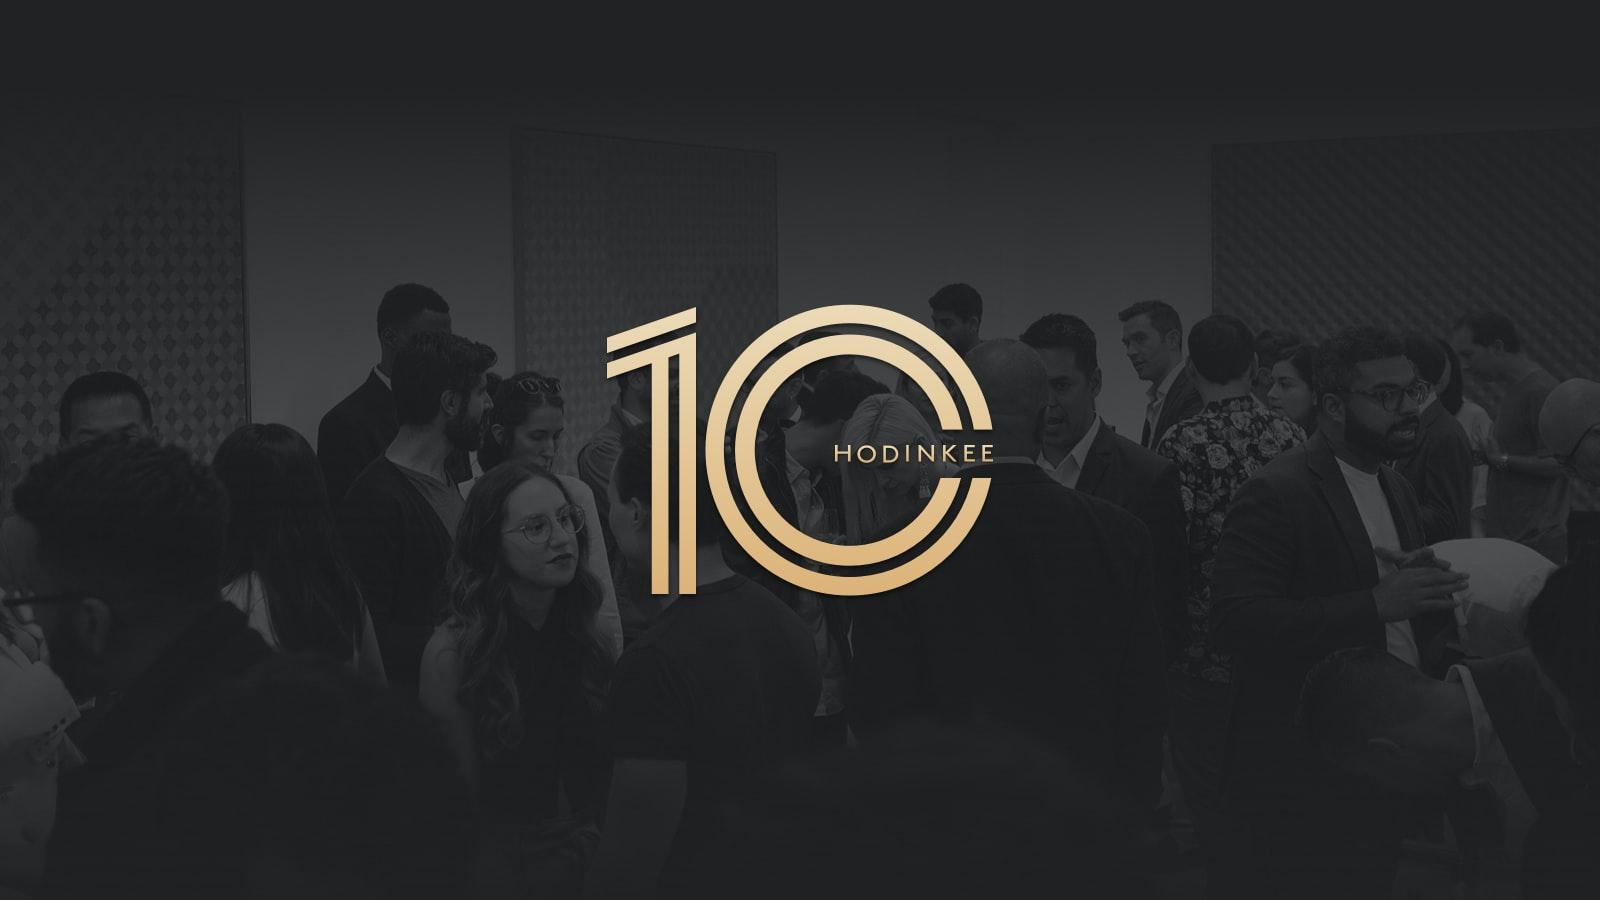 Happenings: Register Now For The HODINKEE 10th Anniversary Weekend h 10 hero